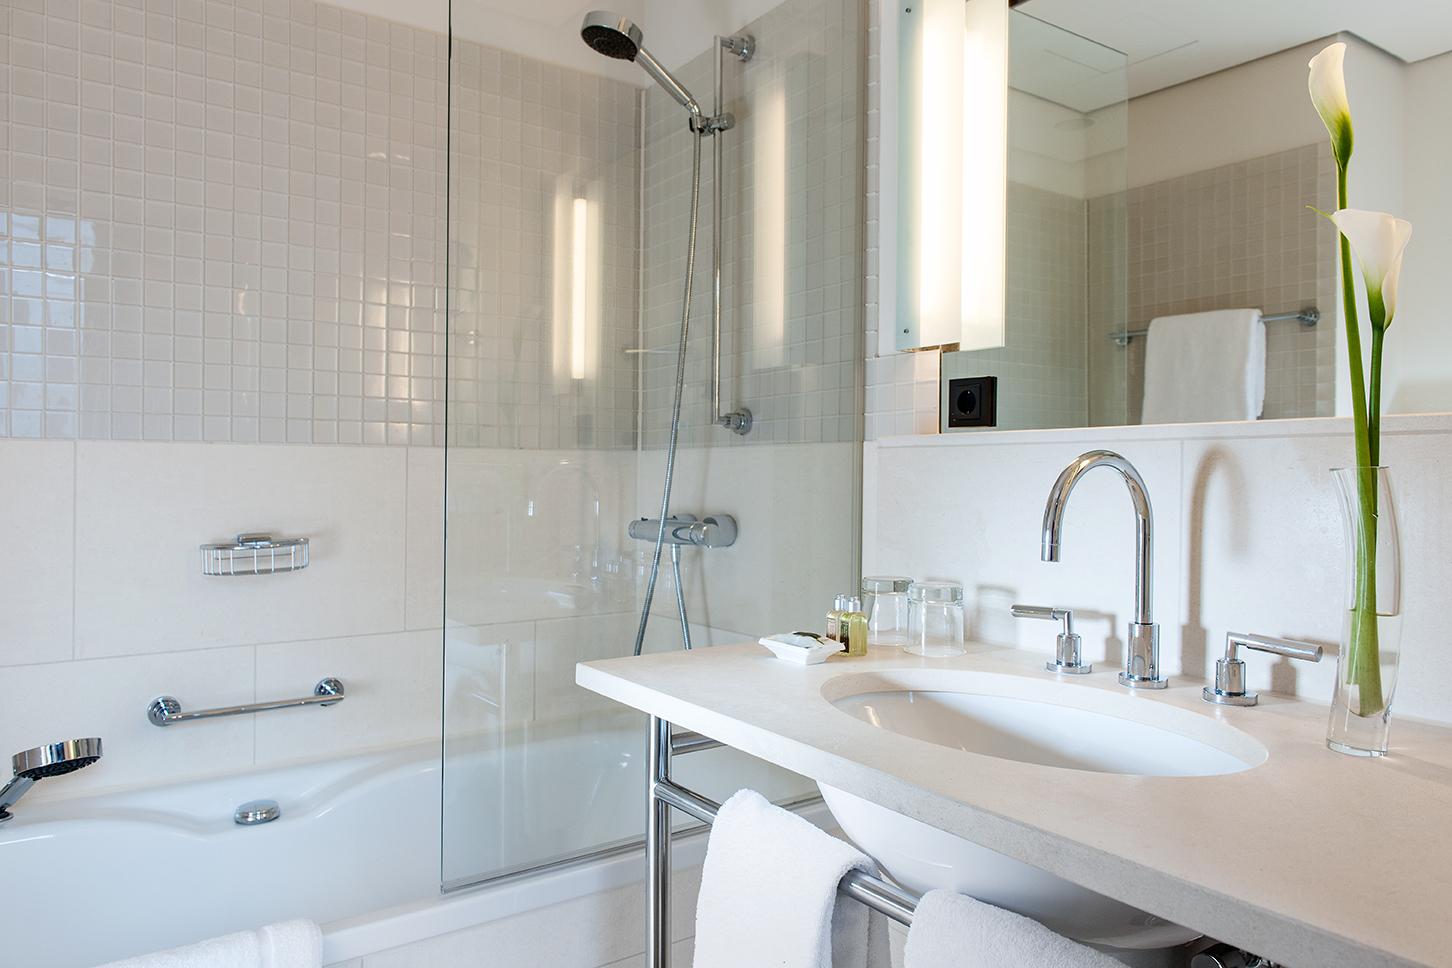 Bathroom at Clipper Elb Lodge - Citybase Apartments